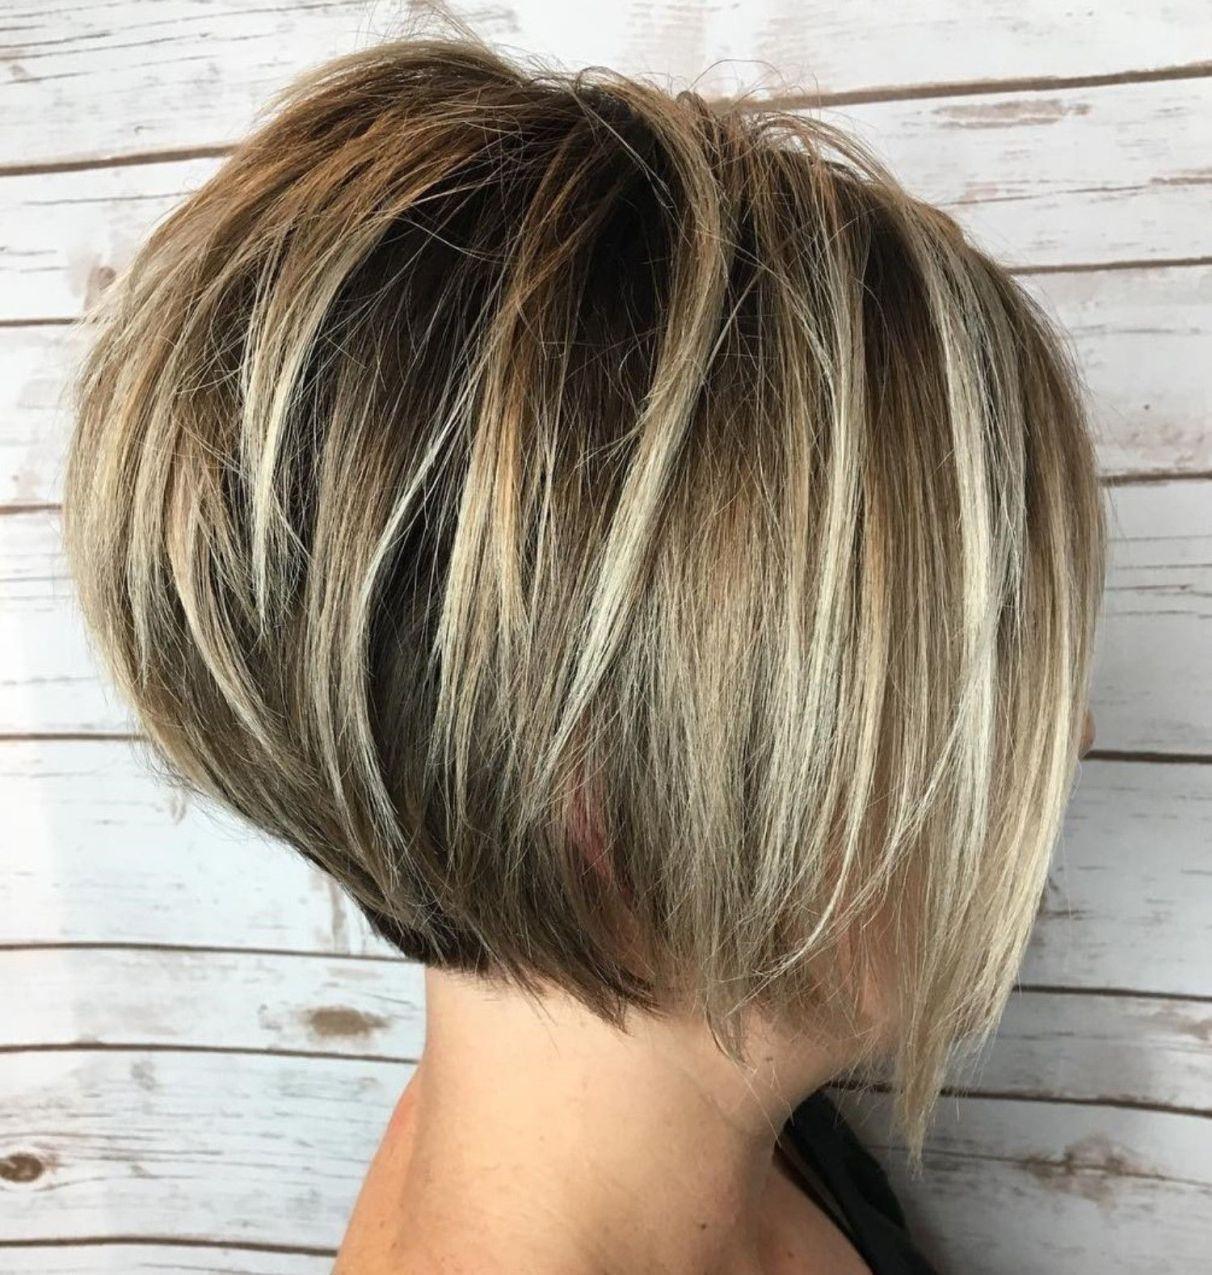 Short Layered Bob With Blonde Highlights Short Hair With Layers Hair Styles Layered Hair